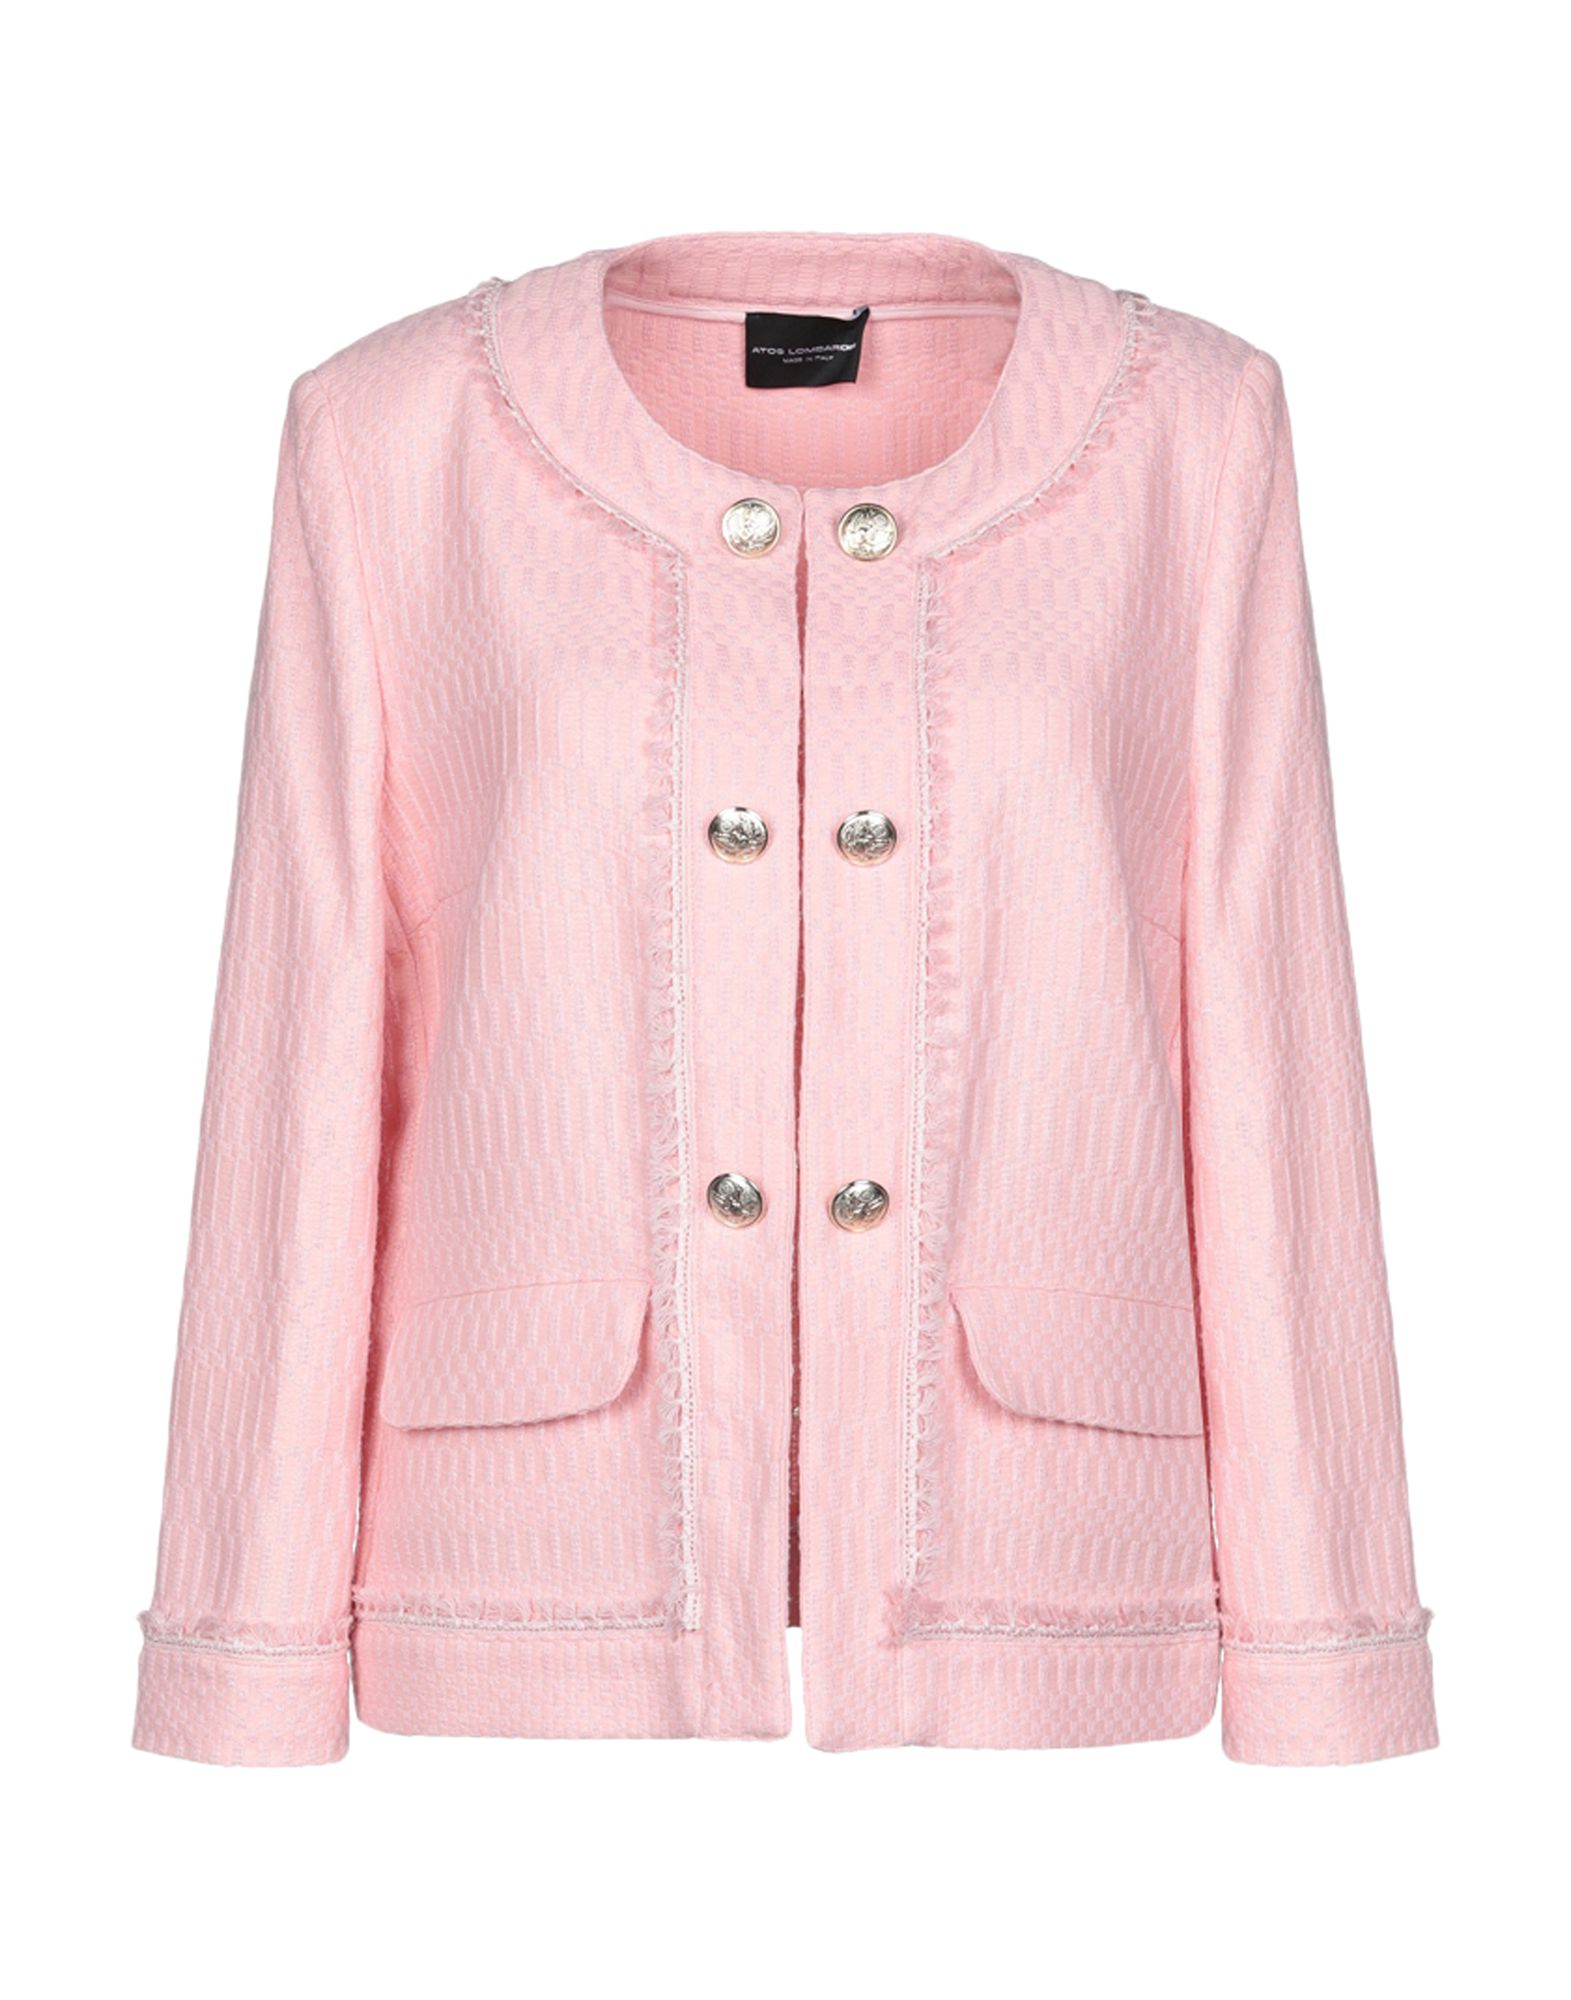 ATOS LOMBARDINI Blazers in Light Pink